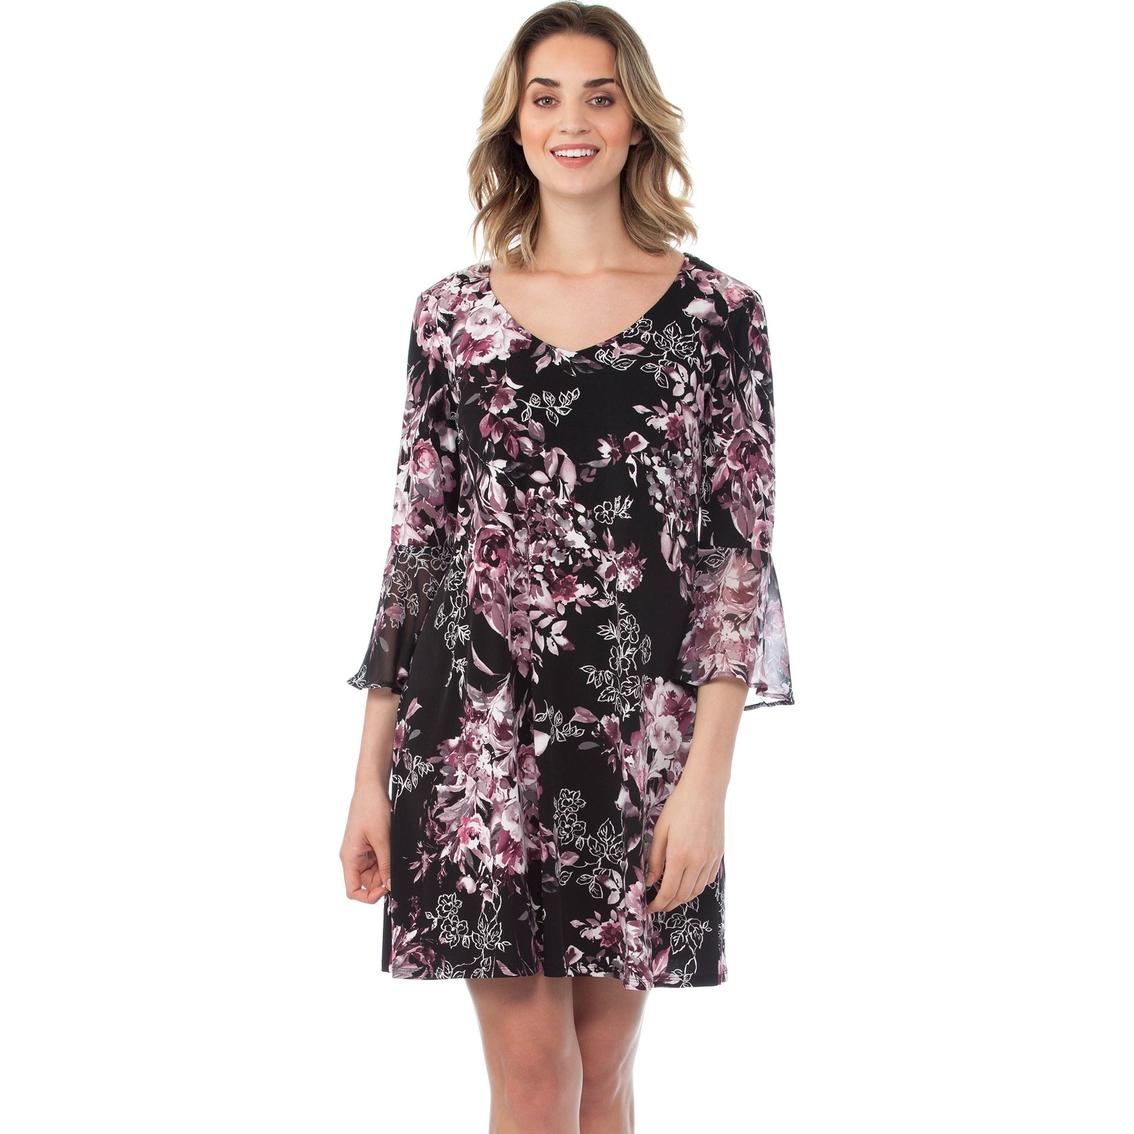 735f37dac25 Connected A-line Print Chiffon Dress